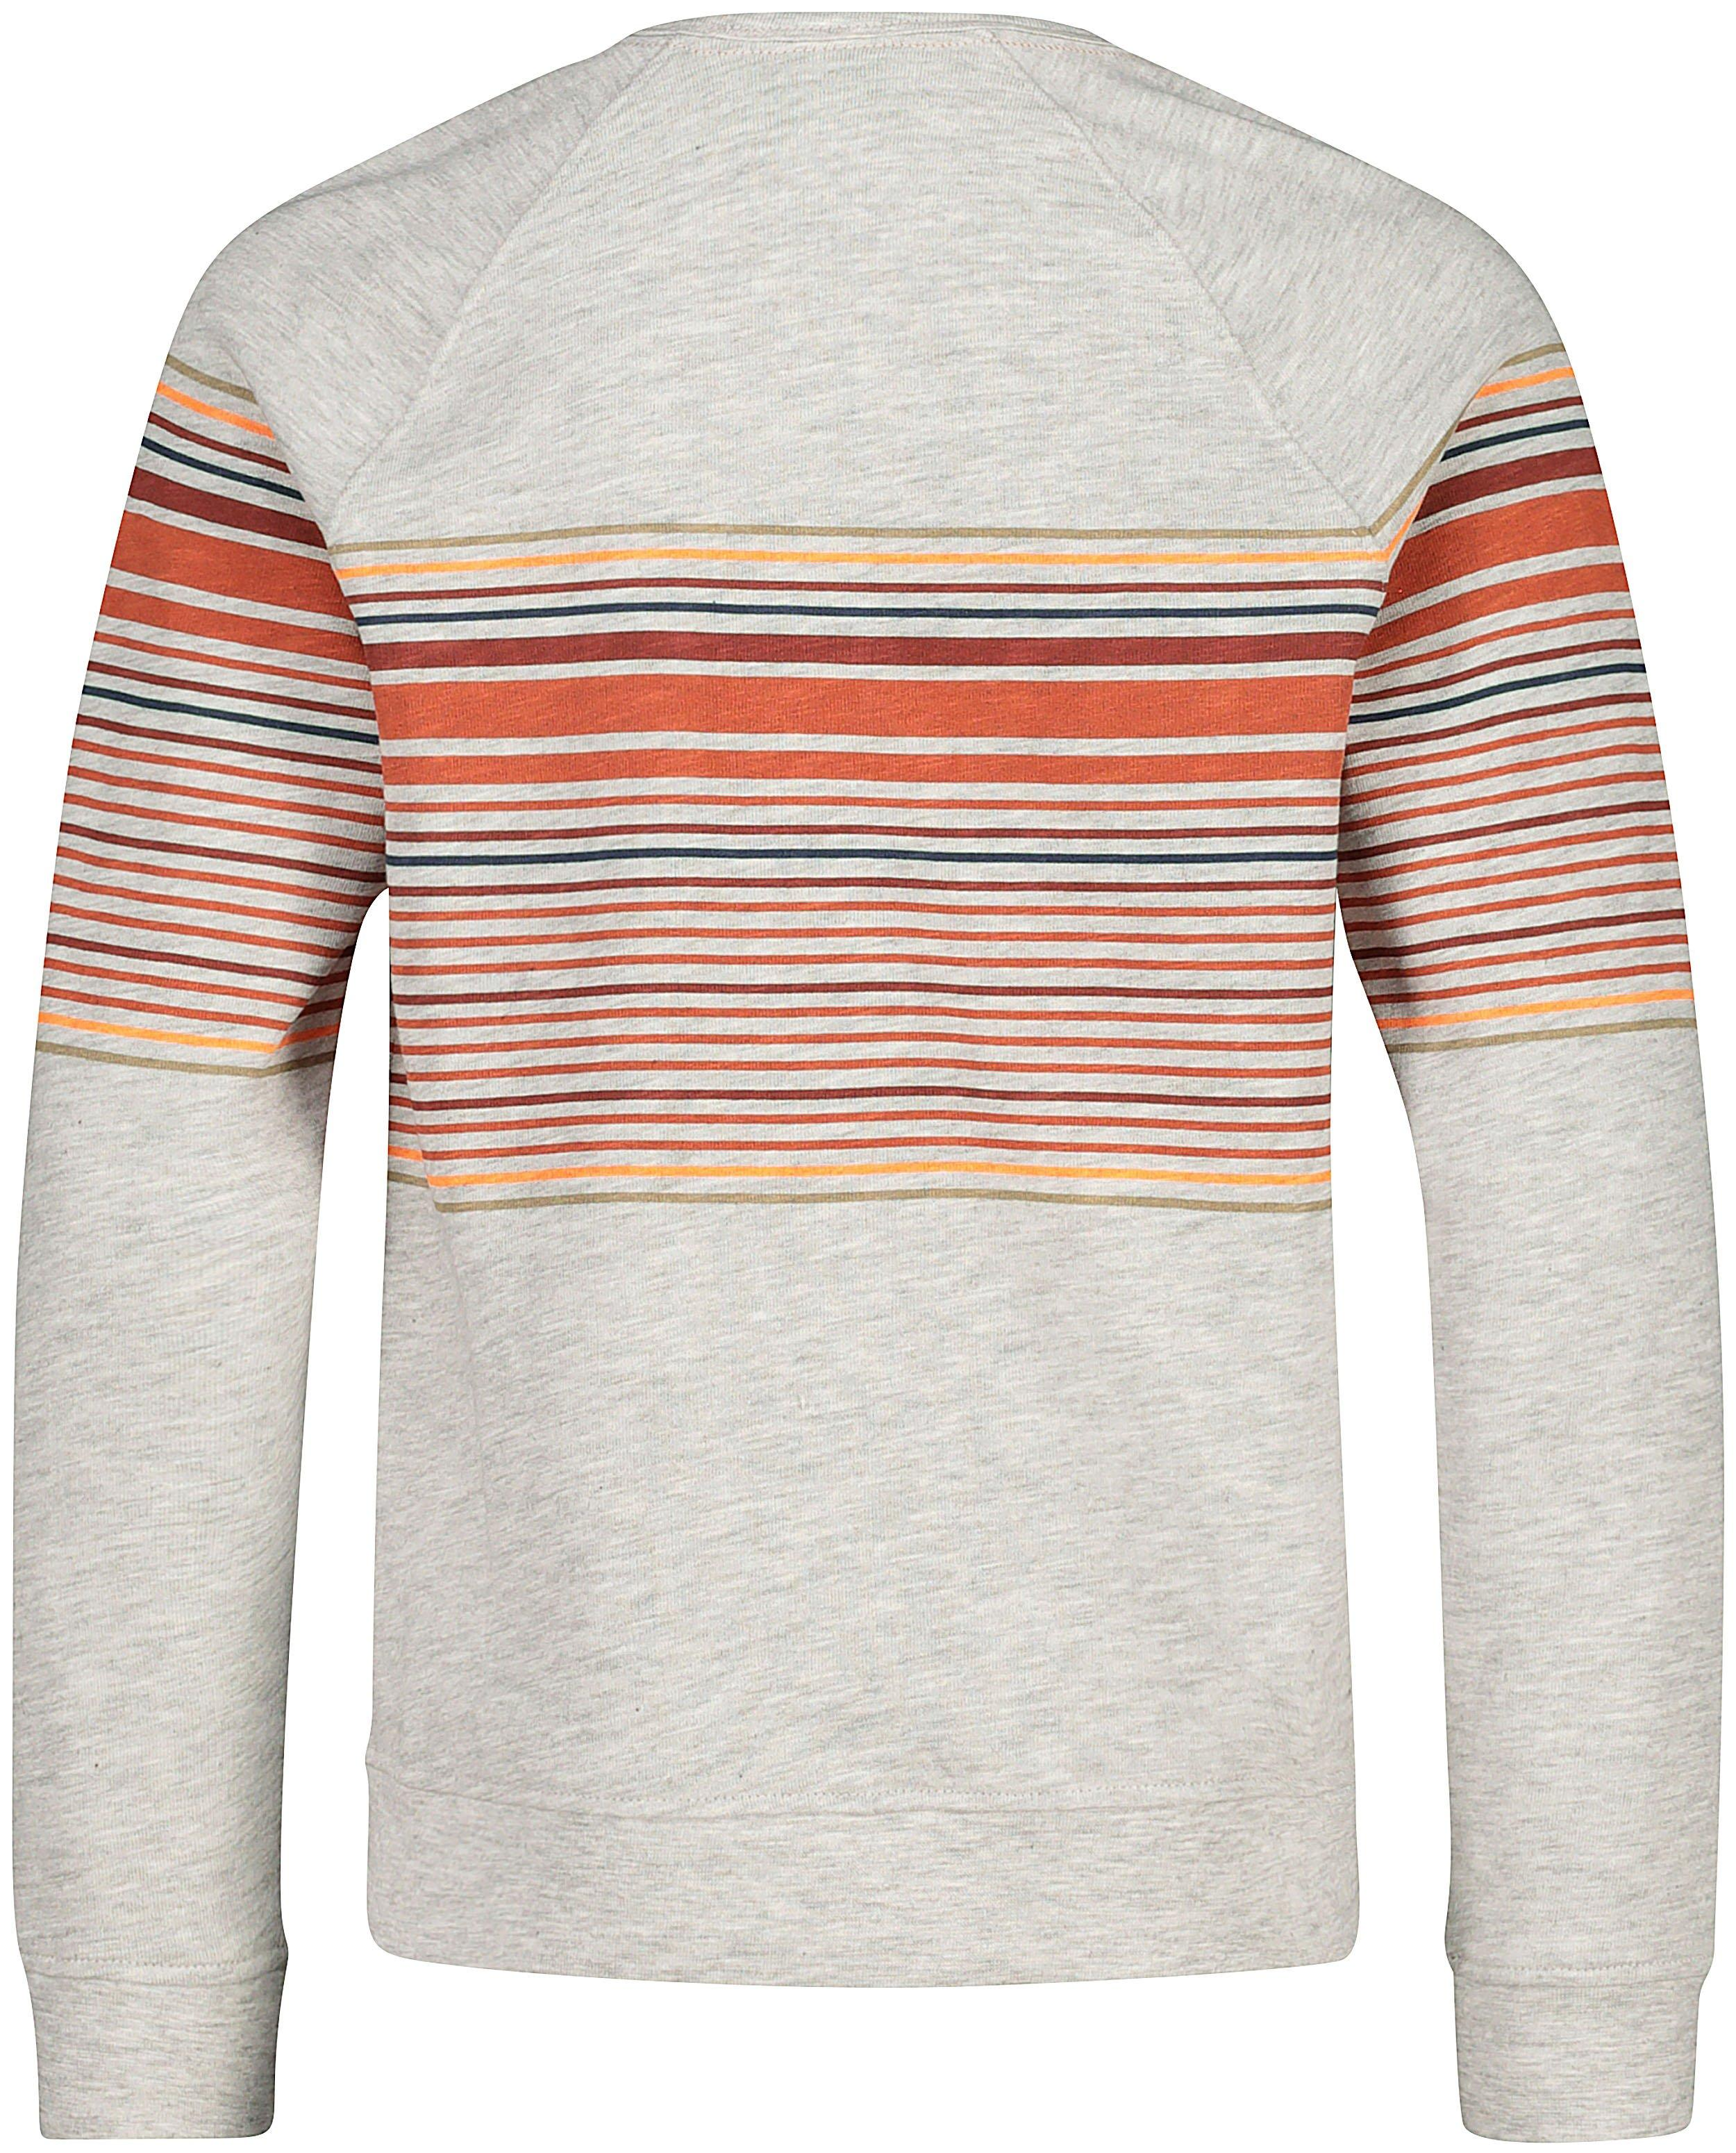 Sweaters - Lichtgrijze sweater met strepen #LikeMe